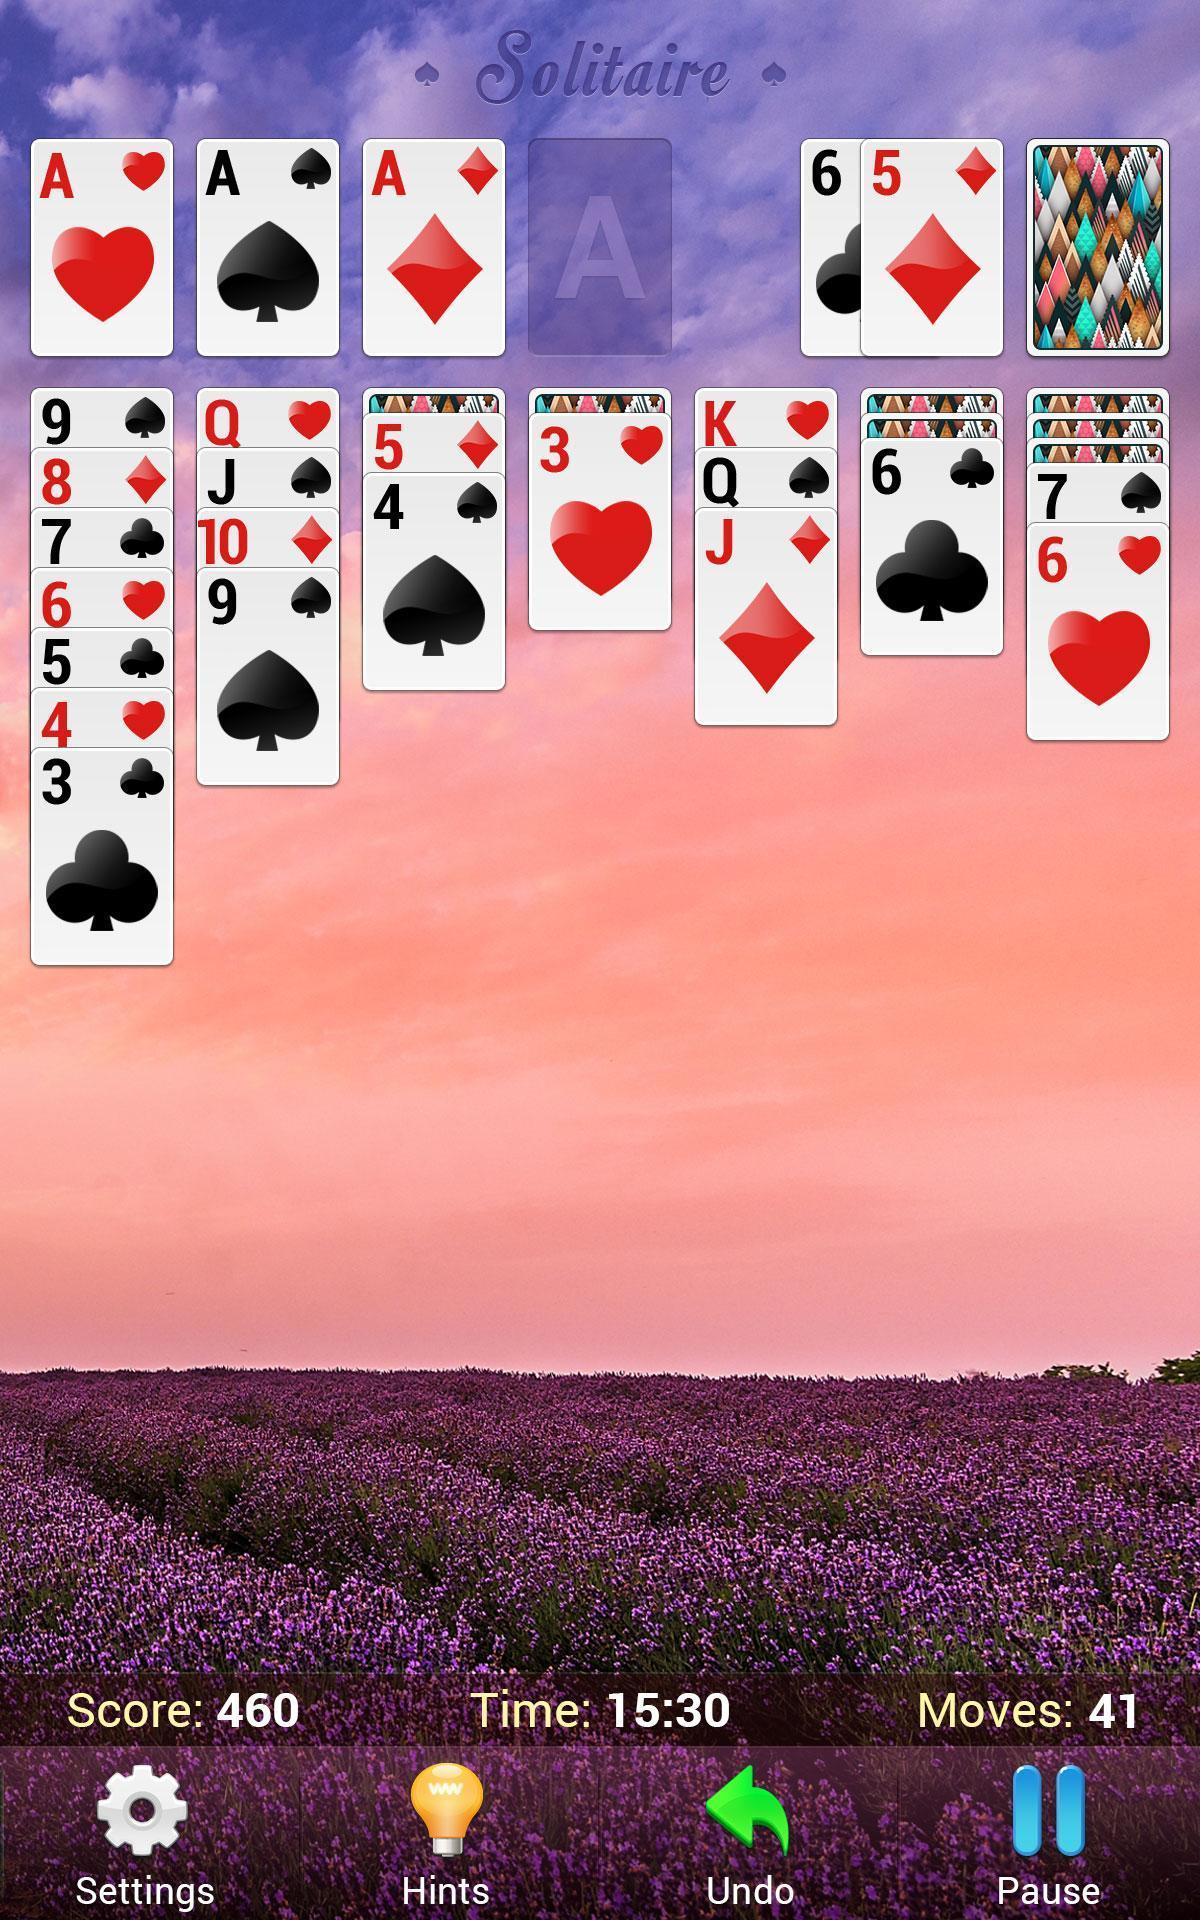 Solitaire Classic Klondike Solitaire Card Game 1.0.27 Screenshot 22